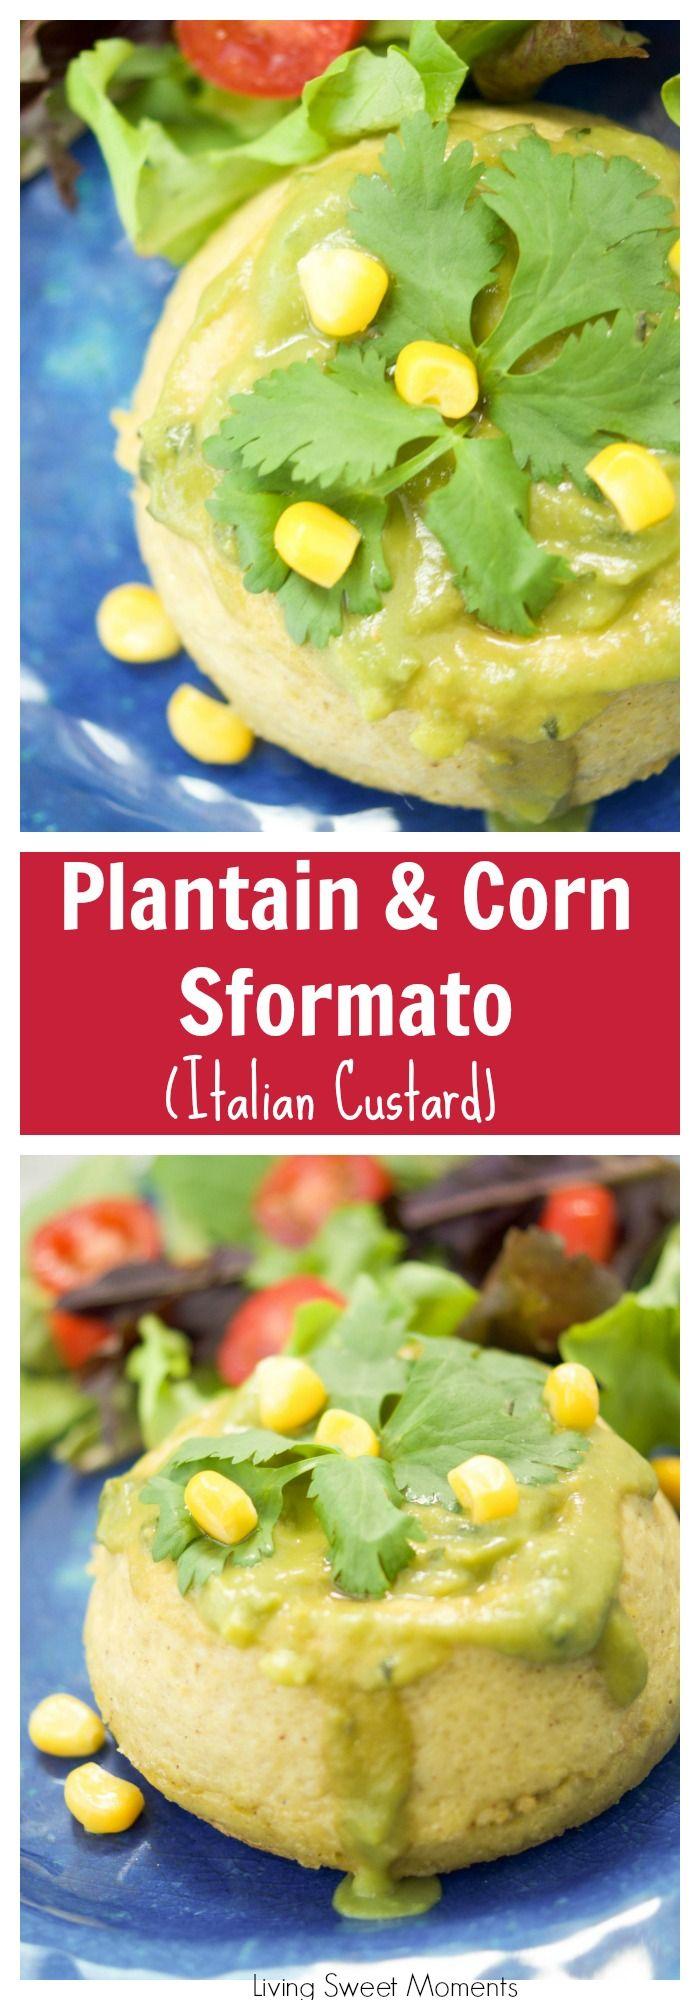 This creamy plantain corn sformato recipe (Italian custard), is the perfect vegetarian entree or appetizer recipe for any occasion. #ad #worldeggday